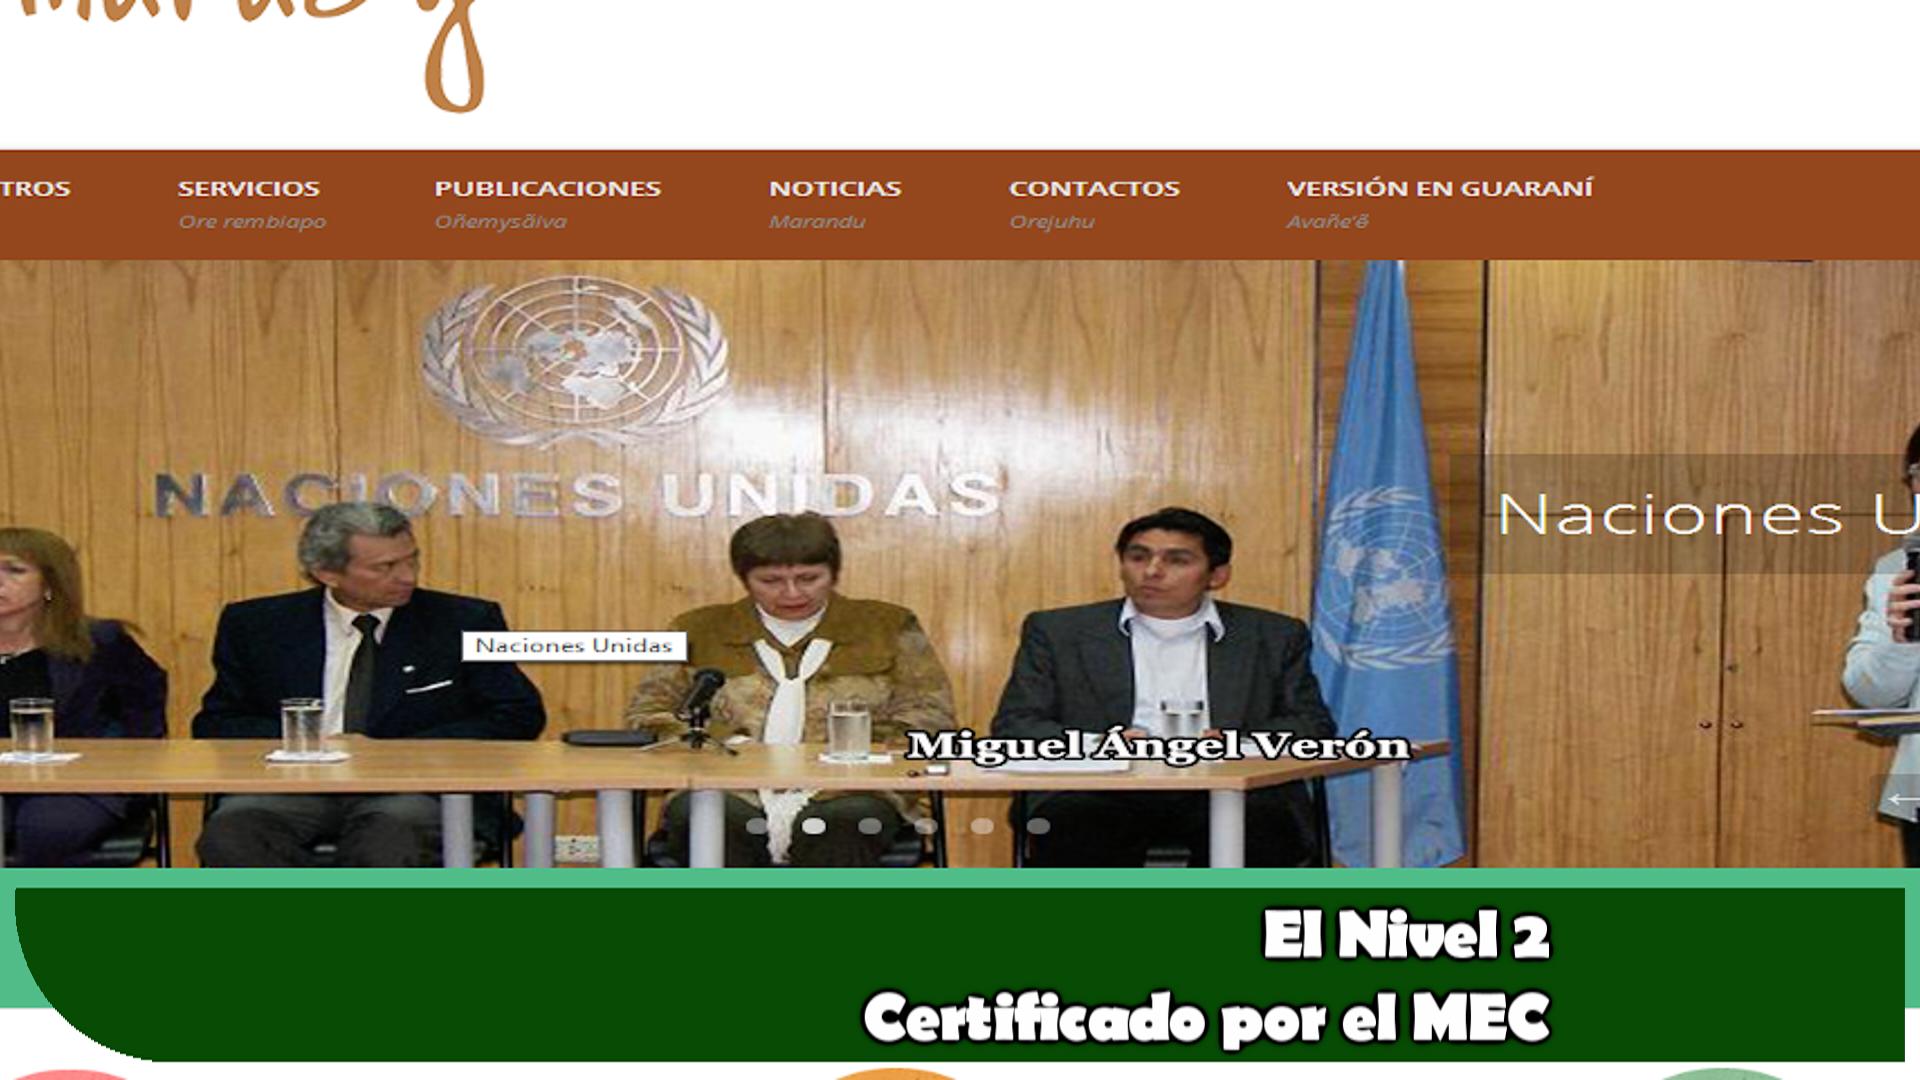 curso_guarani_online_liternauta_org7